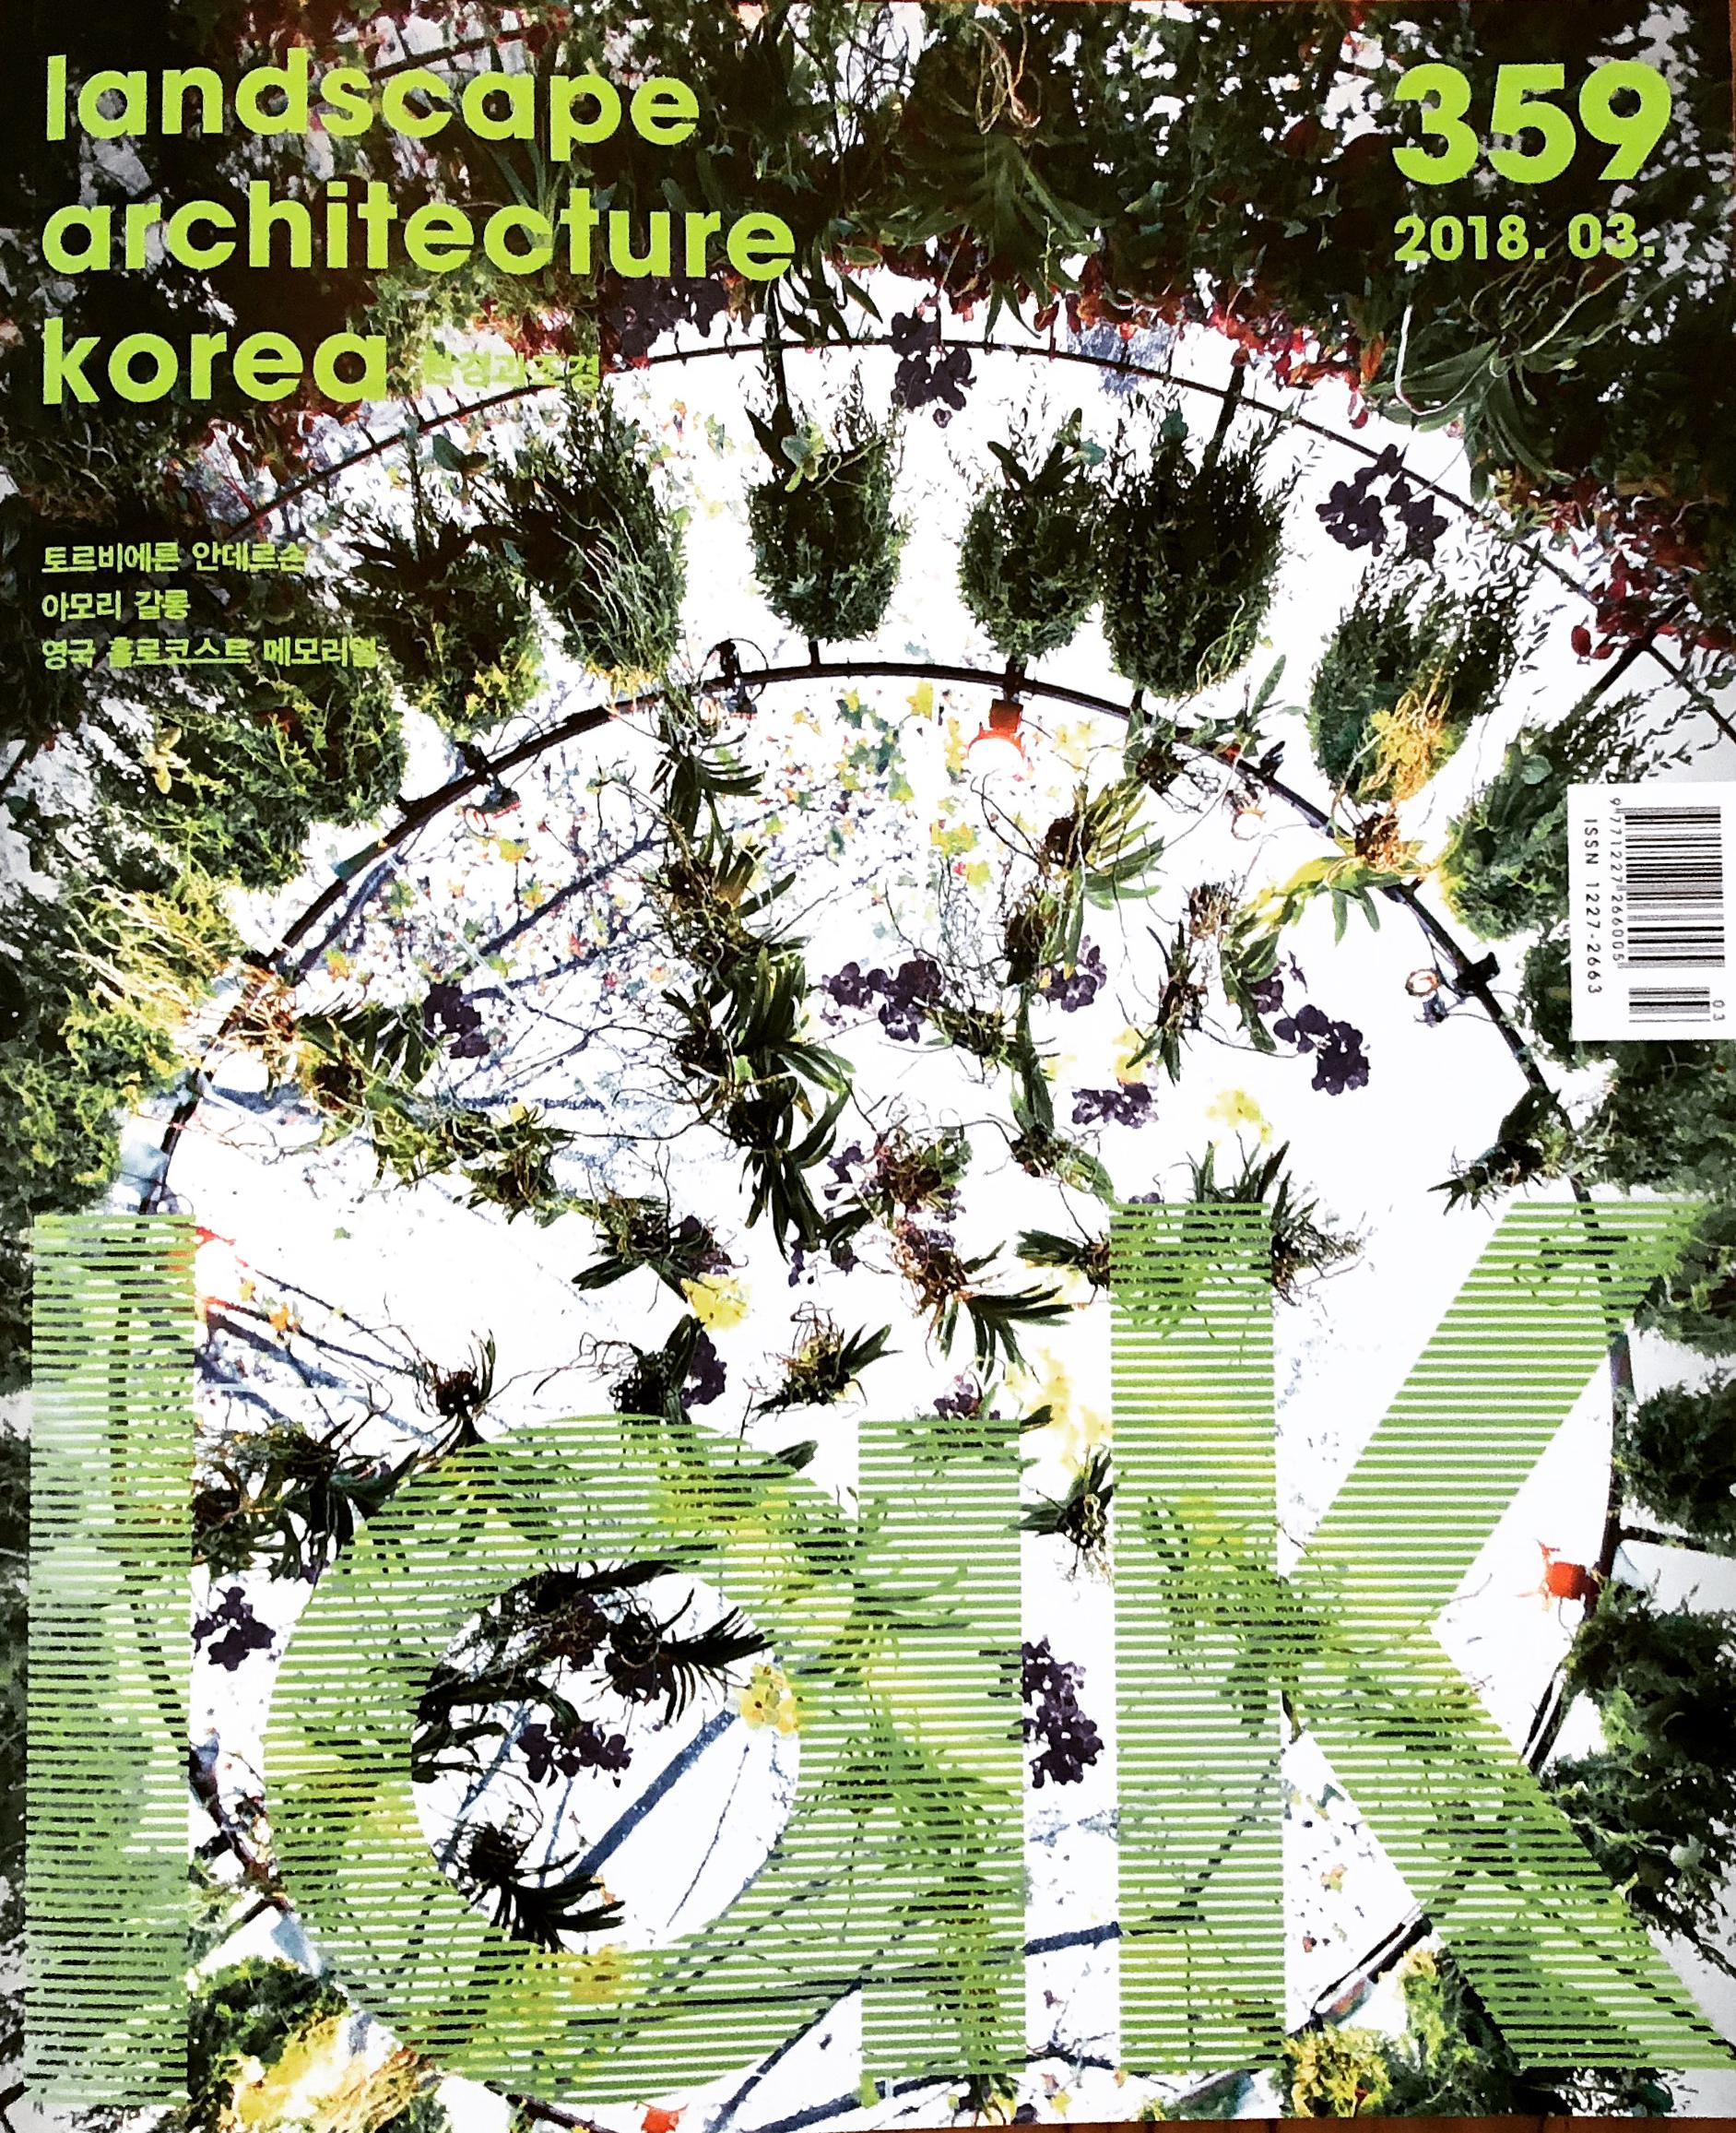 Landscape Arch Korea - Ropewalk (2).JPG